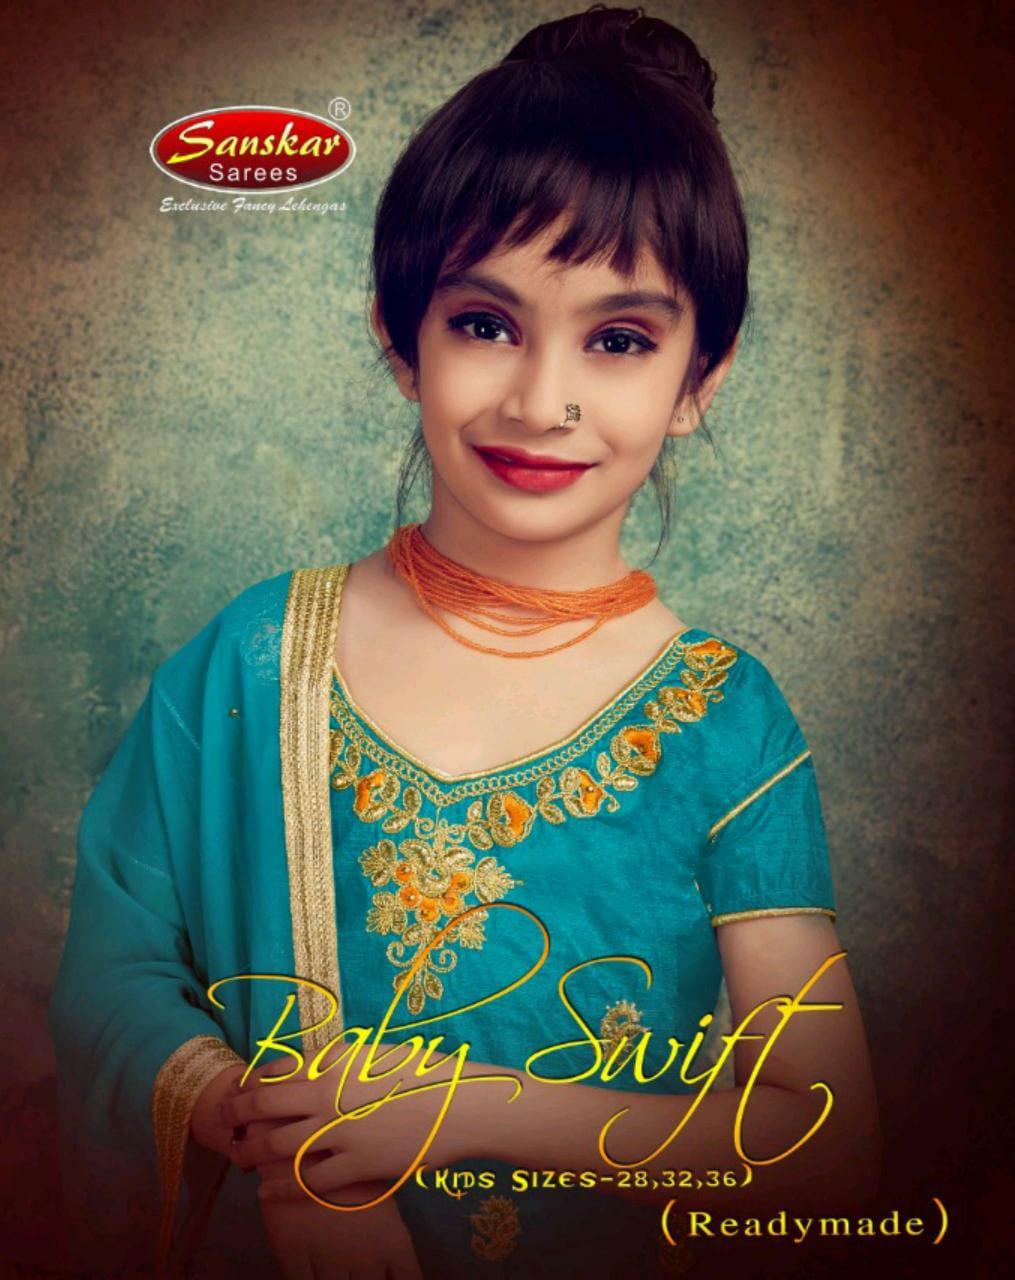 Sanskar Style Baby Swift Silk Child Special Ready Made Lehanga Seller